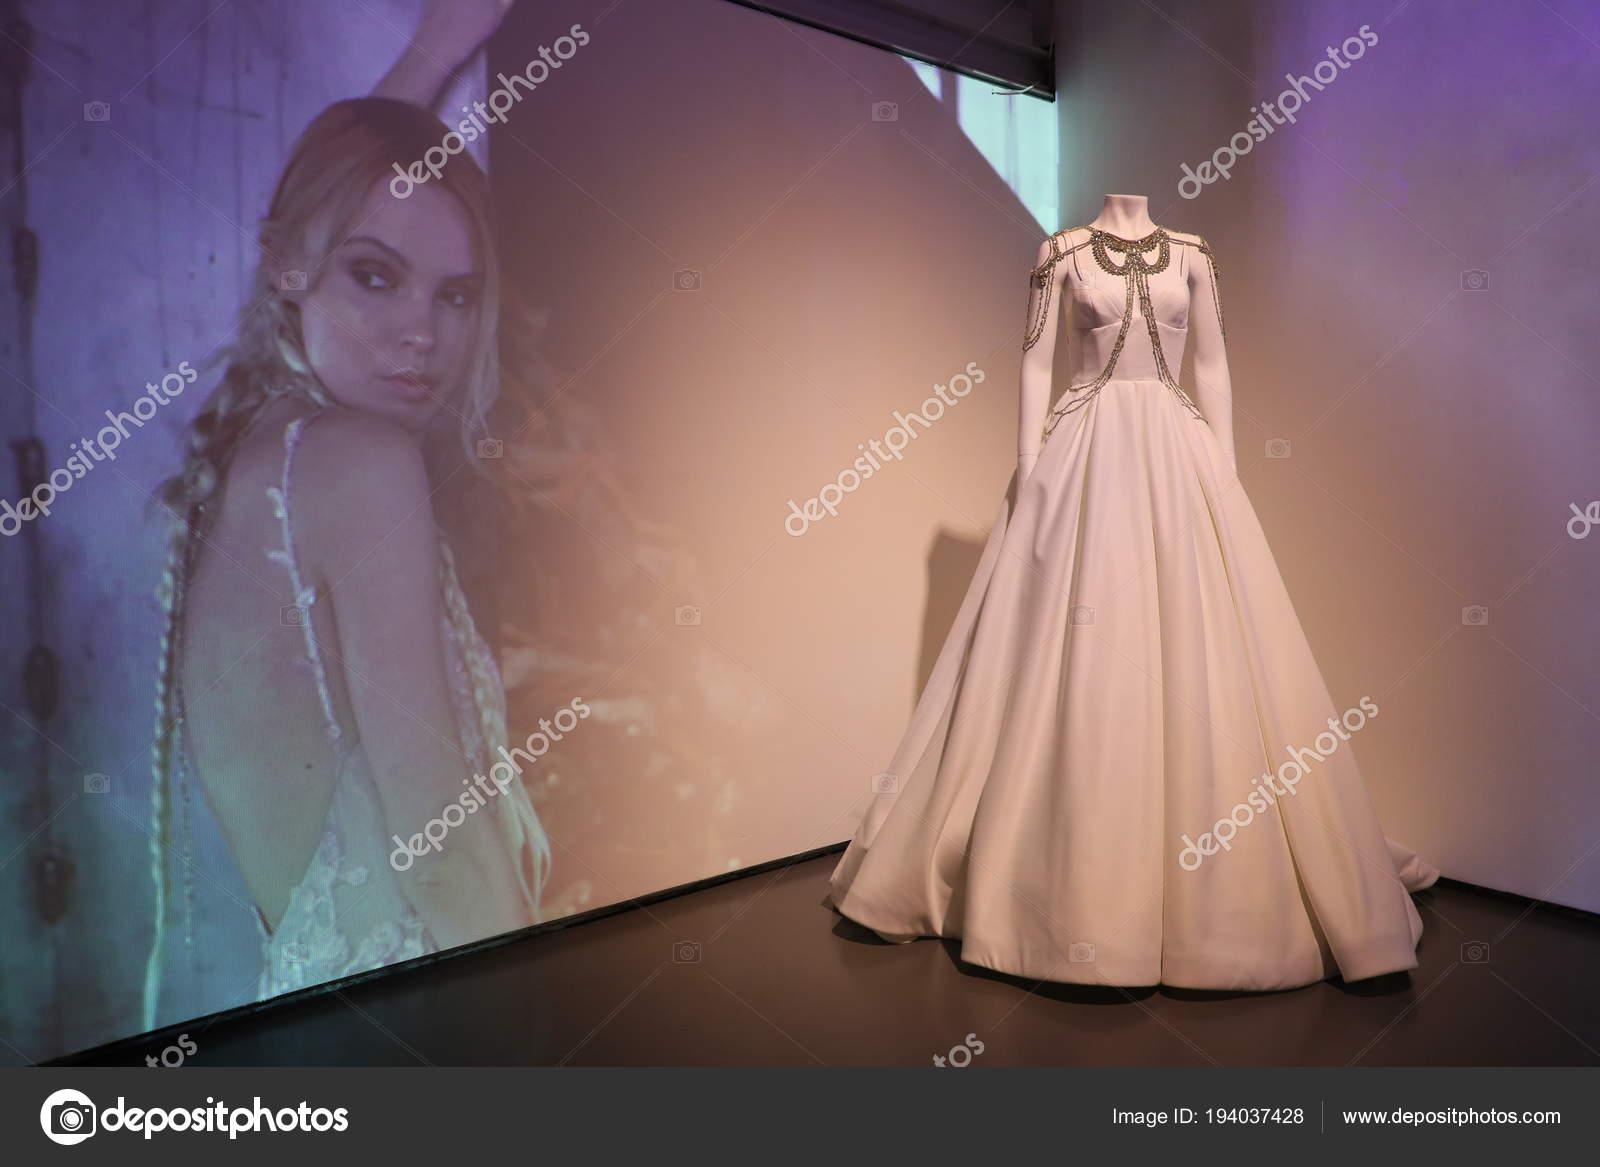 Cocktailjurk Bruiloft 2019.New York April Bruiloft Jurk Presentatie Tijdens 2019 Rivini Alyne